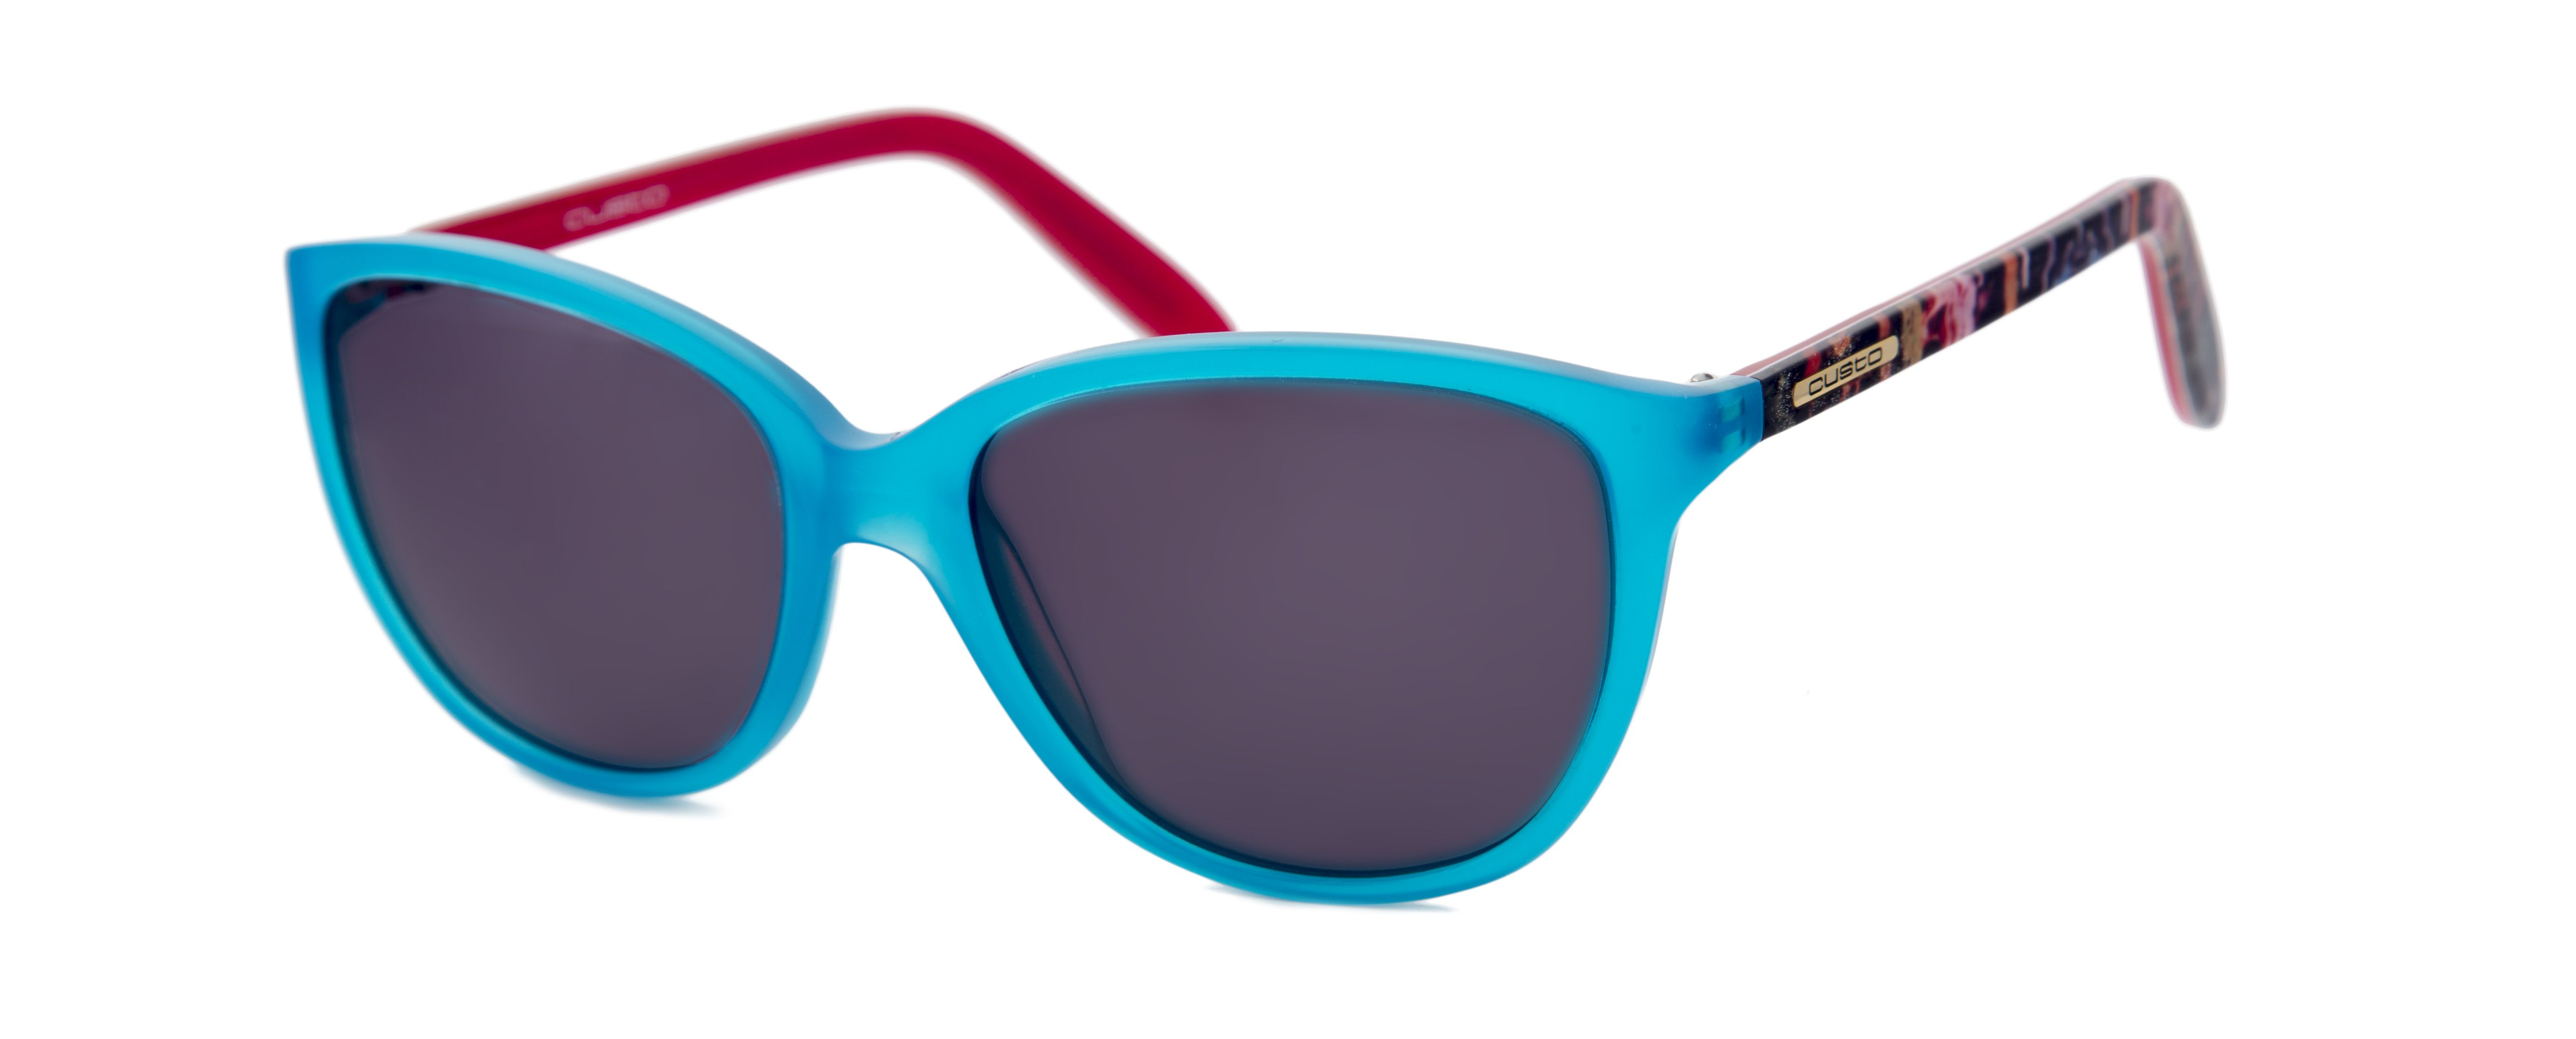 Gafas diseñadas por Custo Dalmau para Opticalia. Montura en color ...